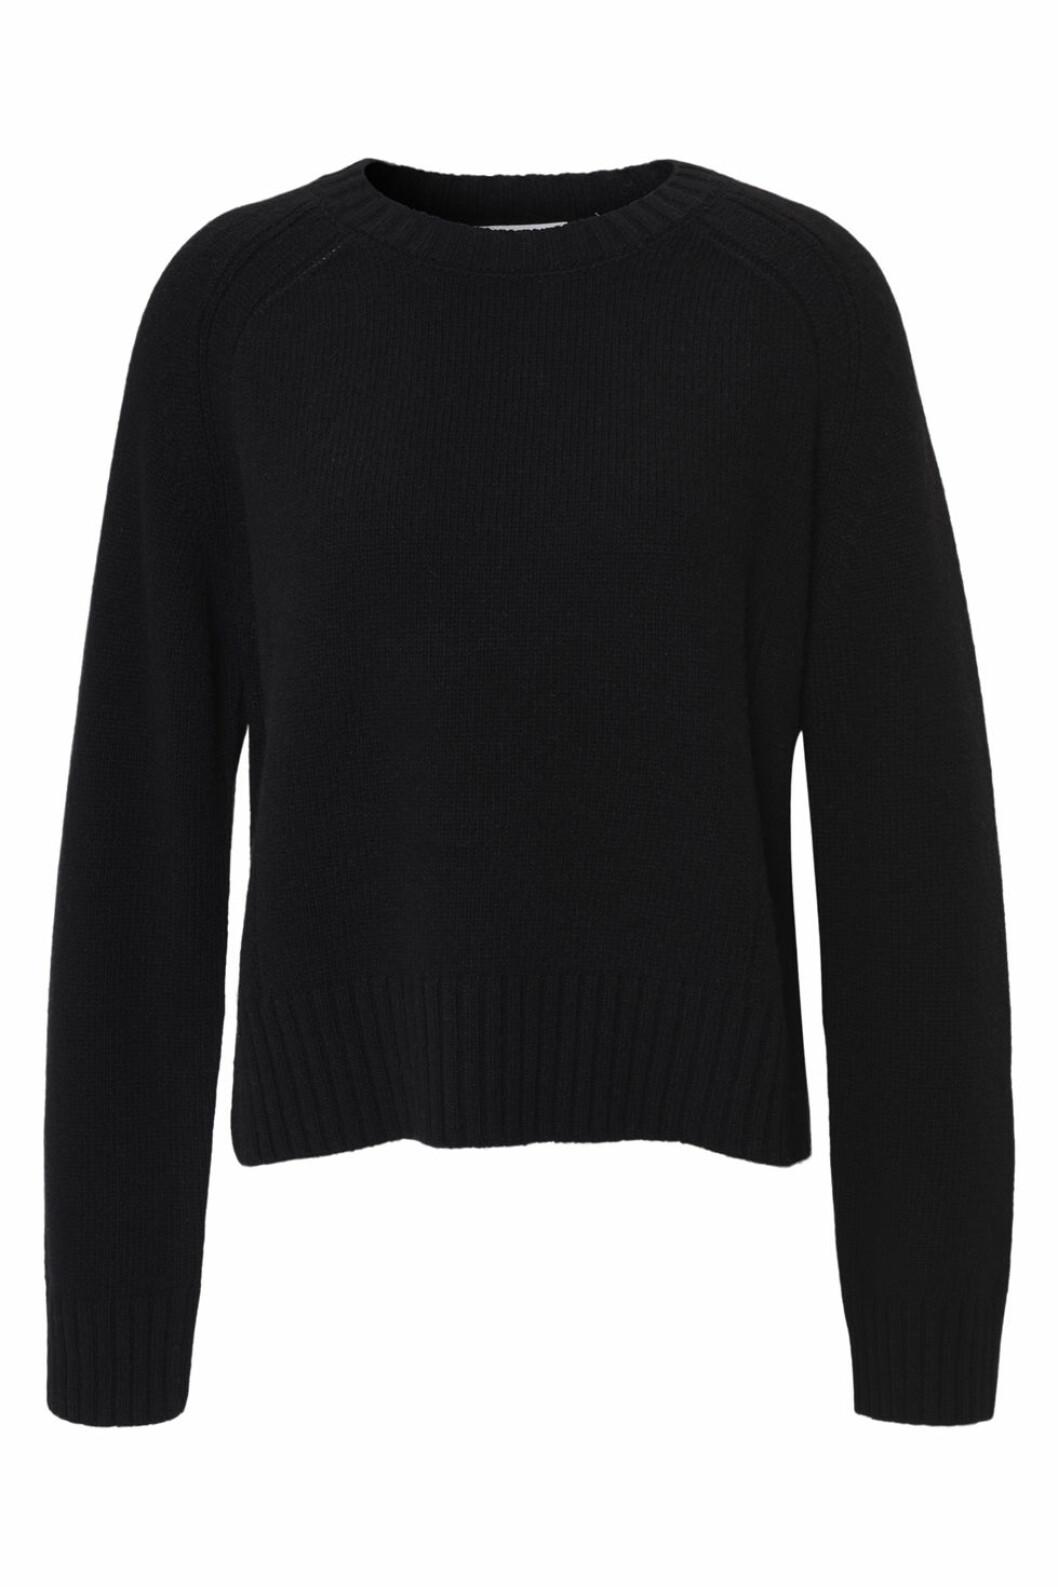 Maria Westerlind x MQ svart tröja